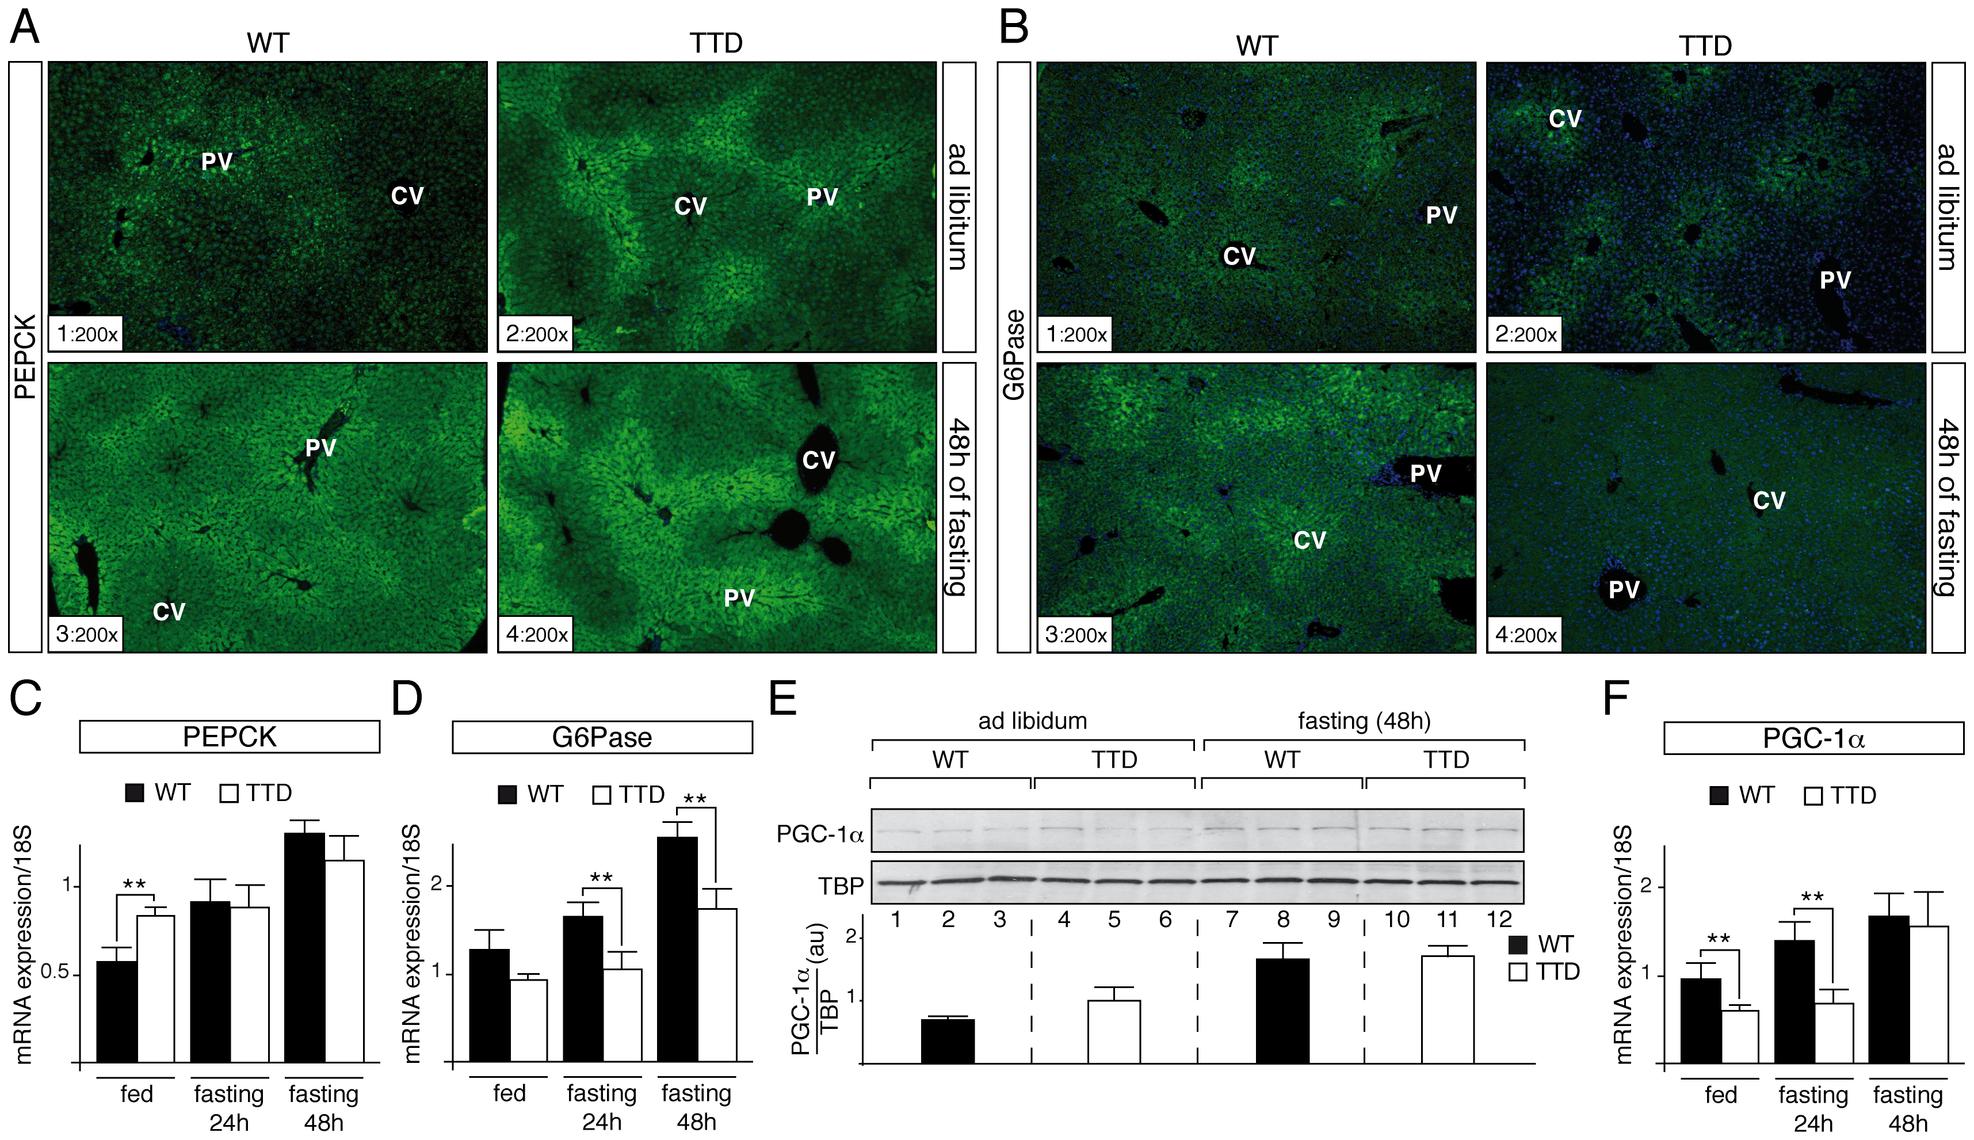 Dysregulation of gluconeogenesis-induced proteins in TTD liver.